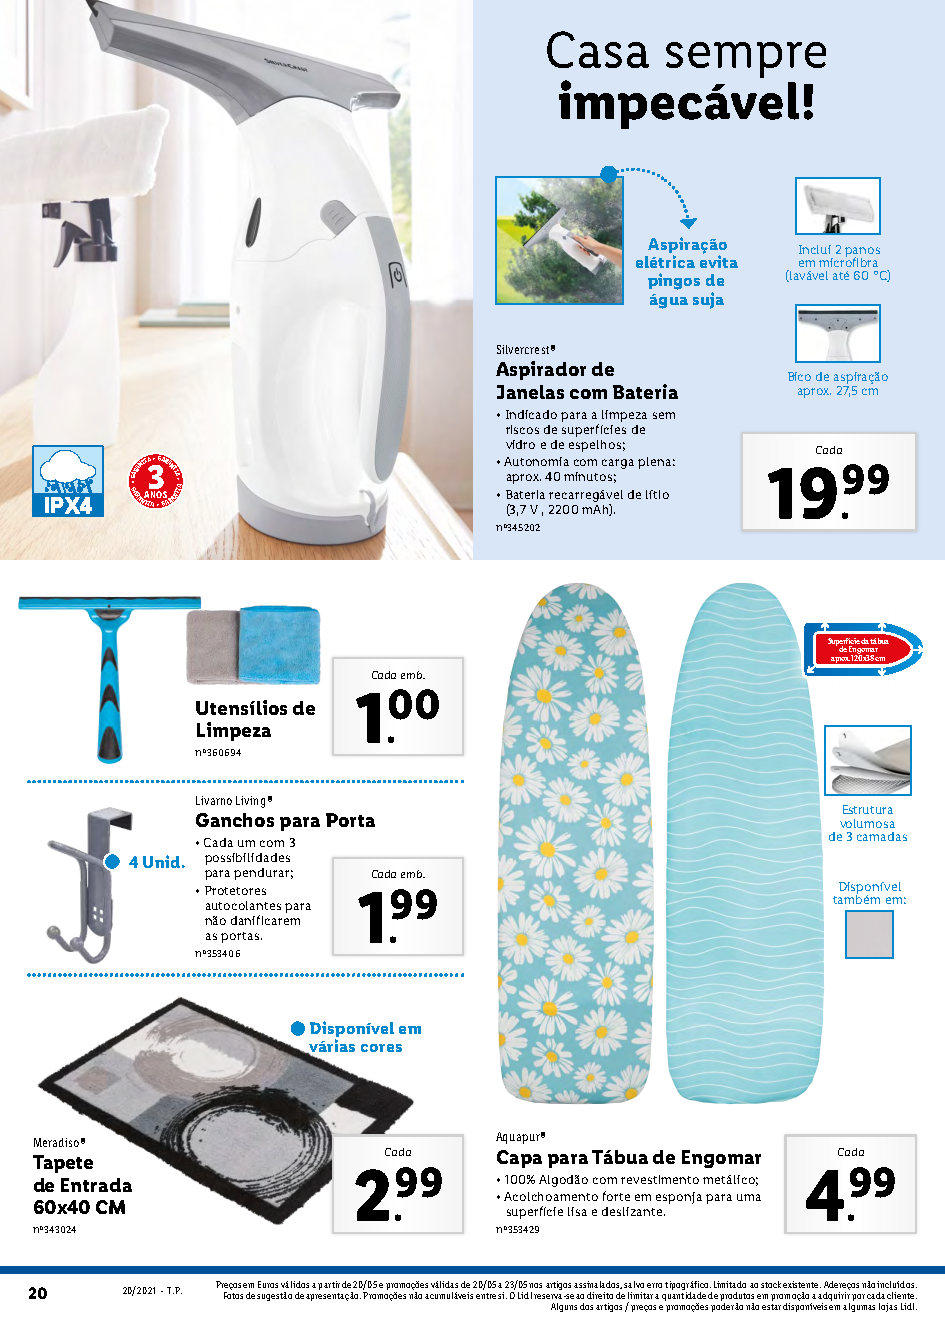 especial folheto lidl bazar 17 maio promocoes Page20 1